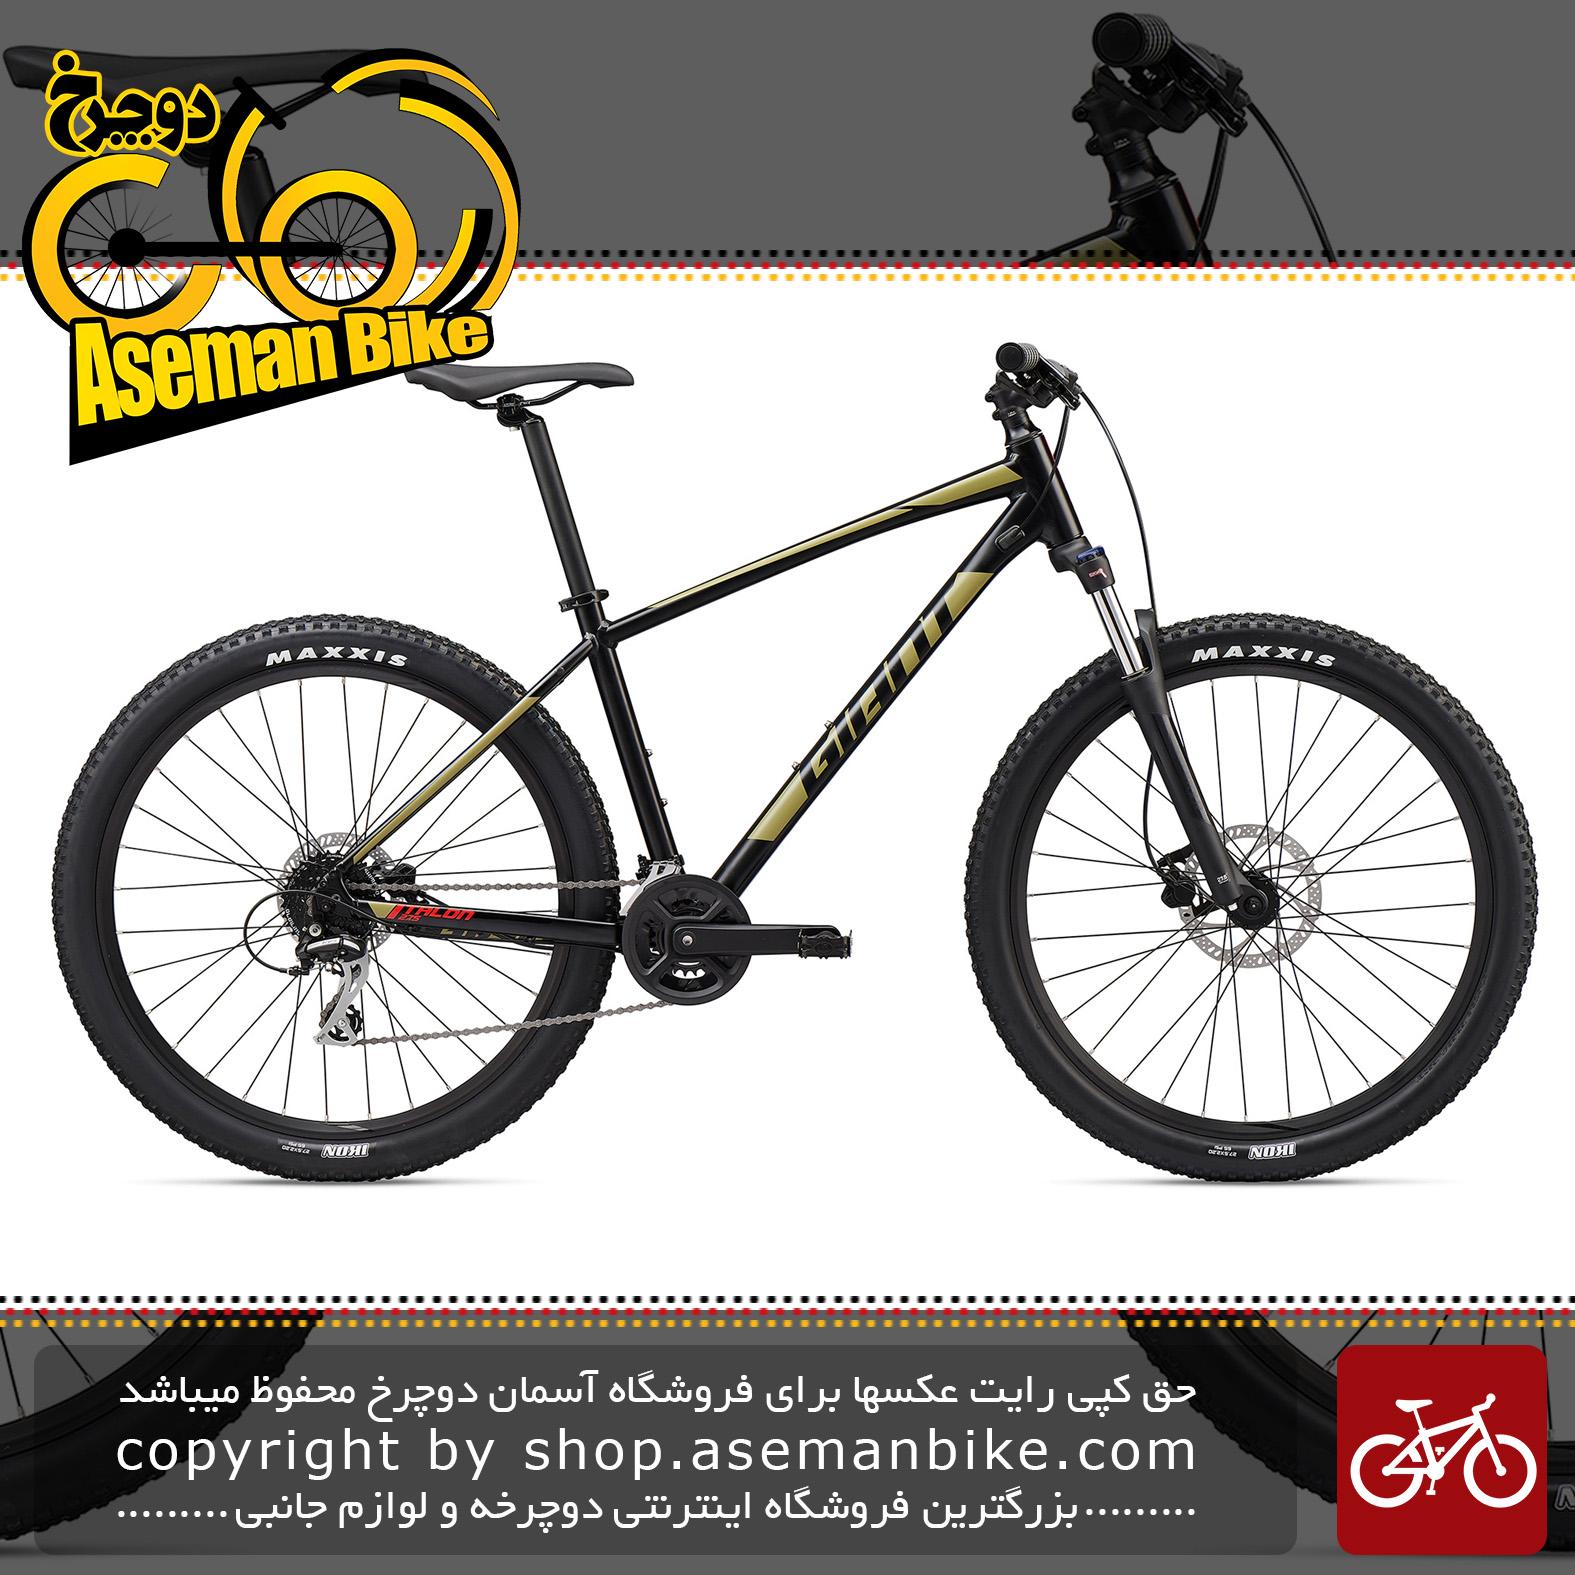 دوچرخه کوهستان جاینت مدل تالون 3 2020 Giant Mountain Bicycle Talon 3 2020